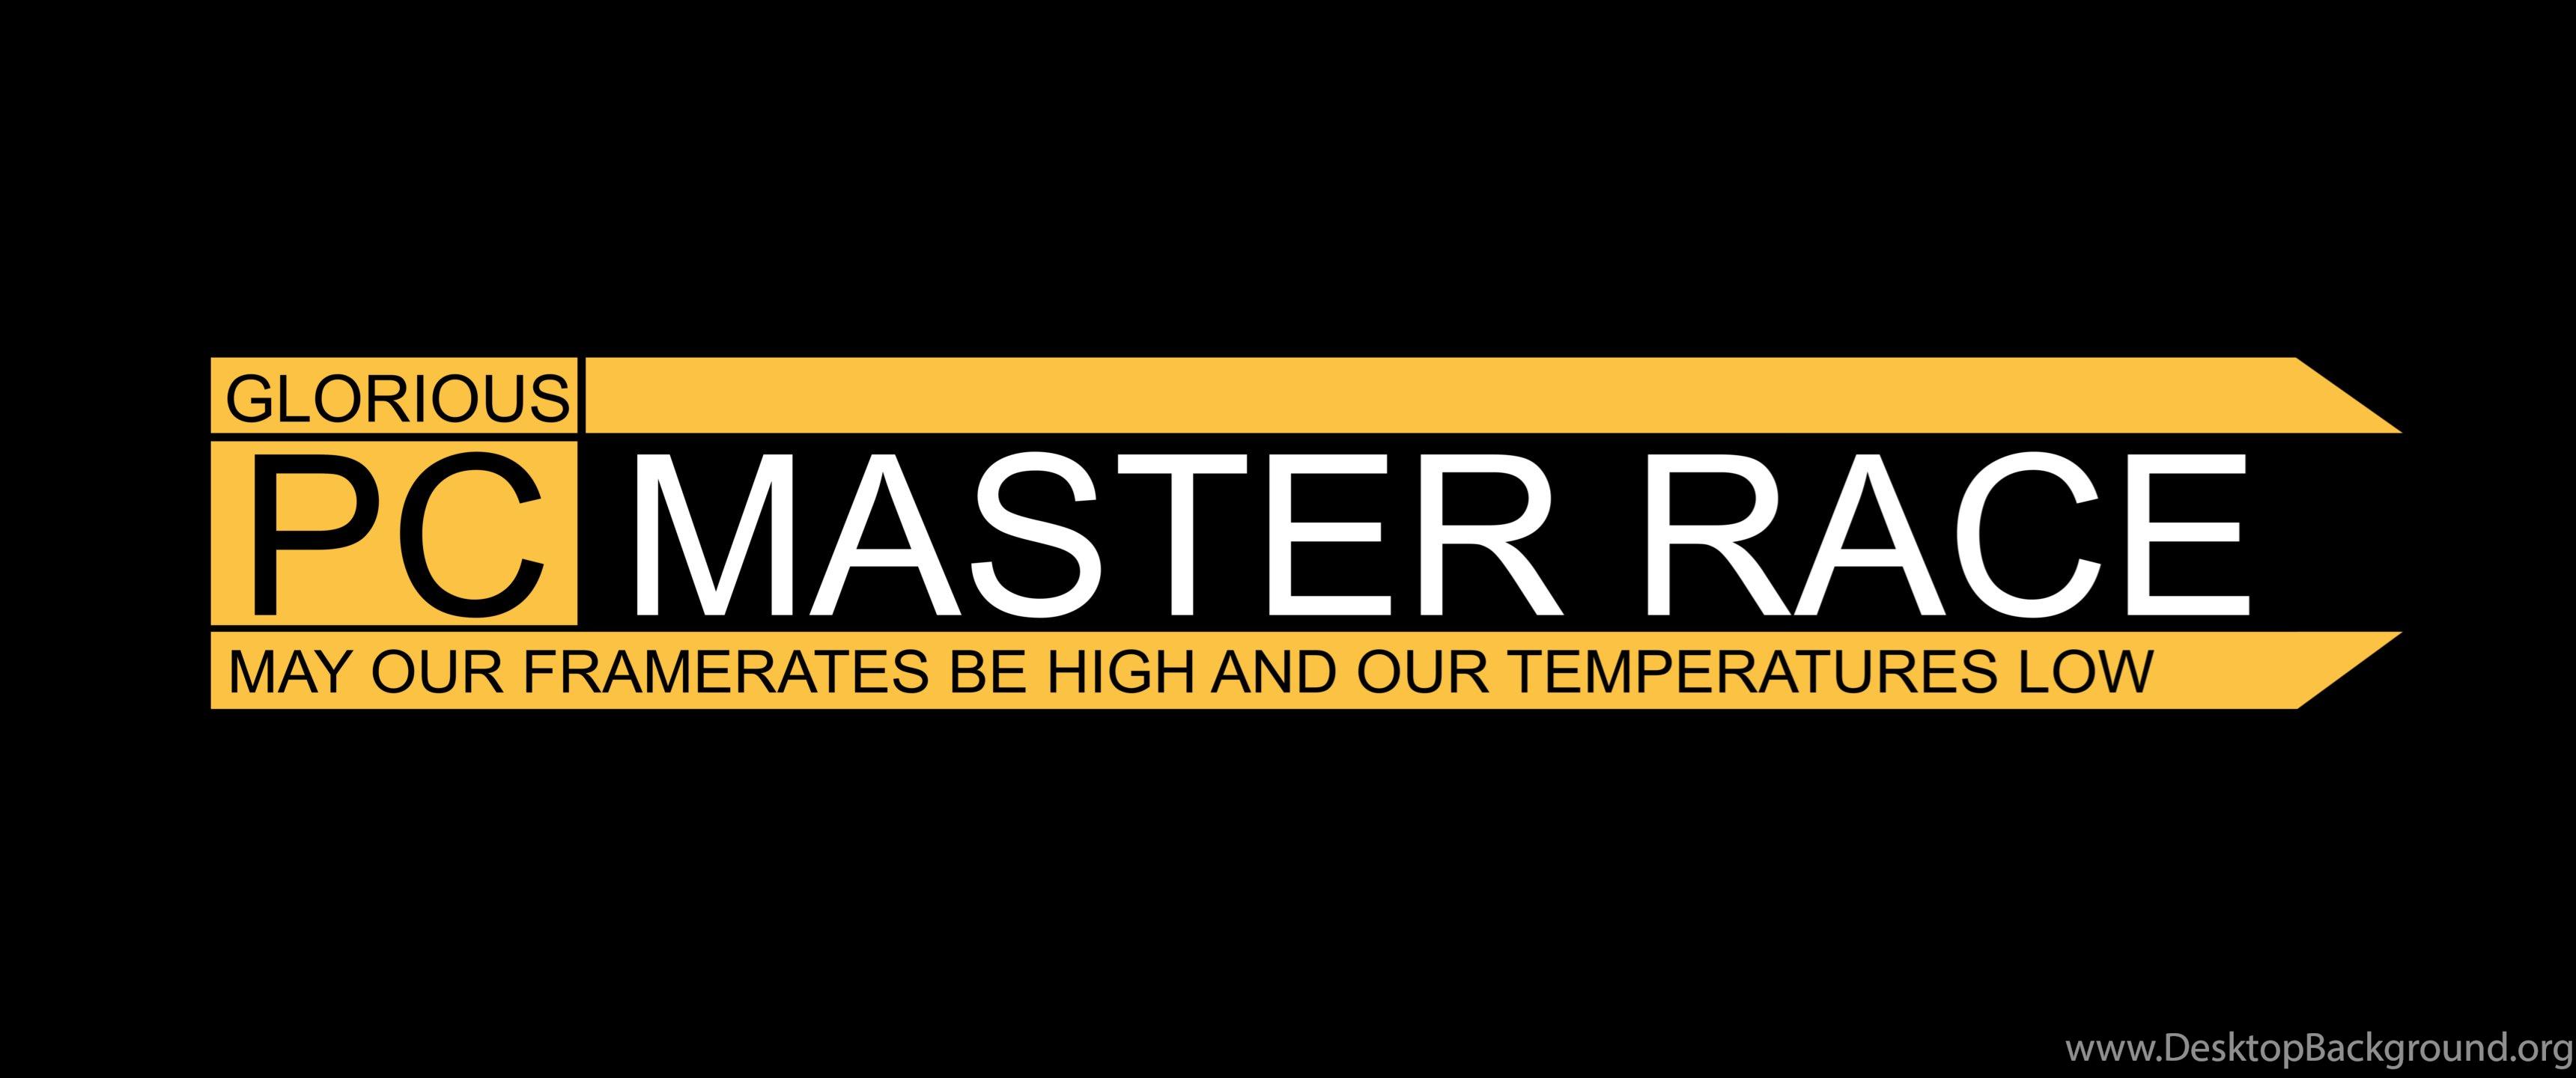 Pc Master Race 21 9 Wallpapers 3440x1440 Pcmasterrace Desktop